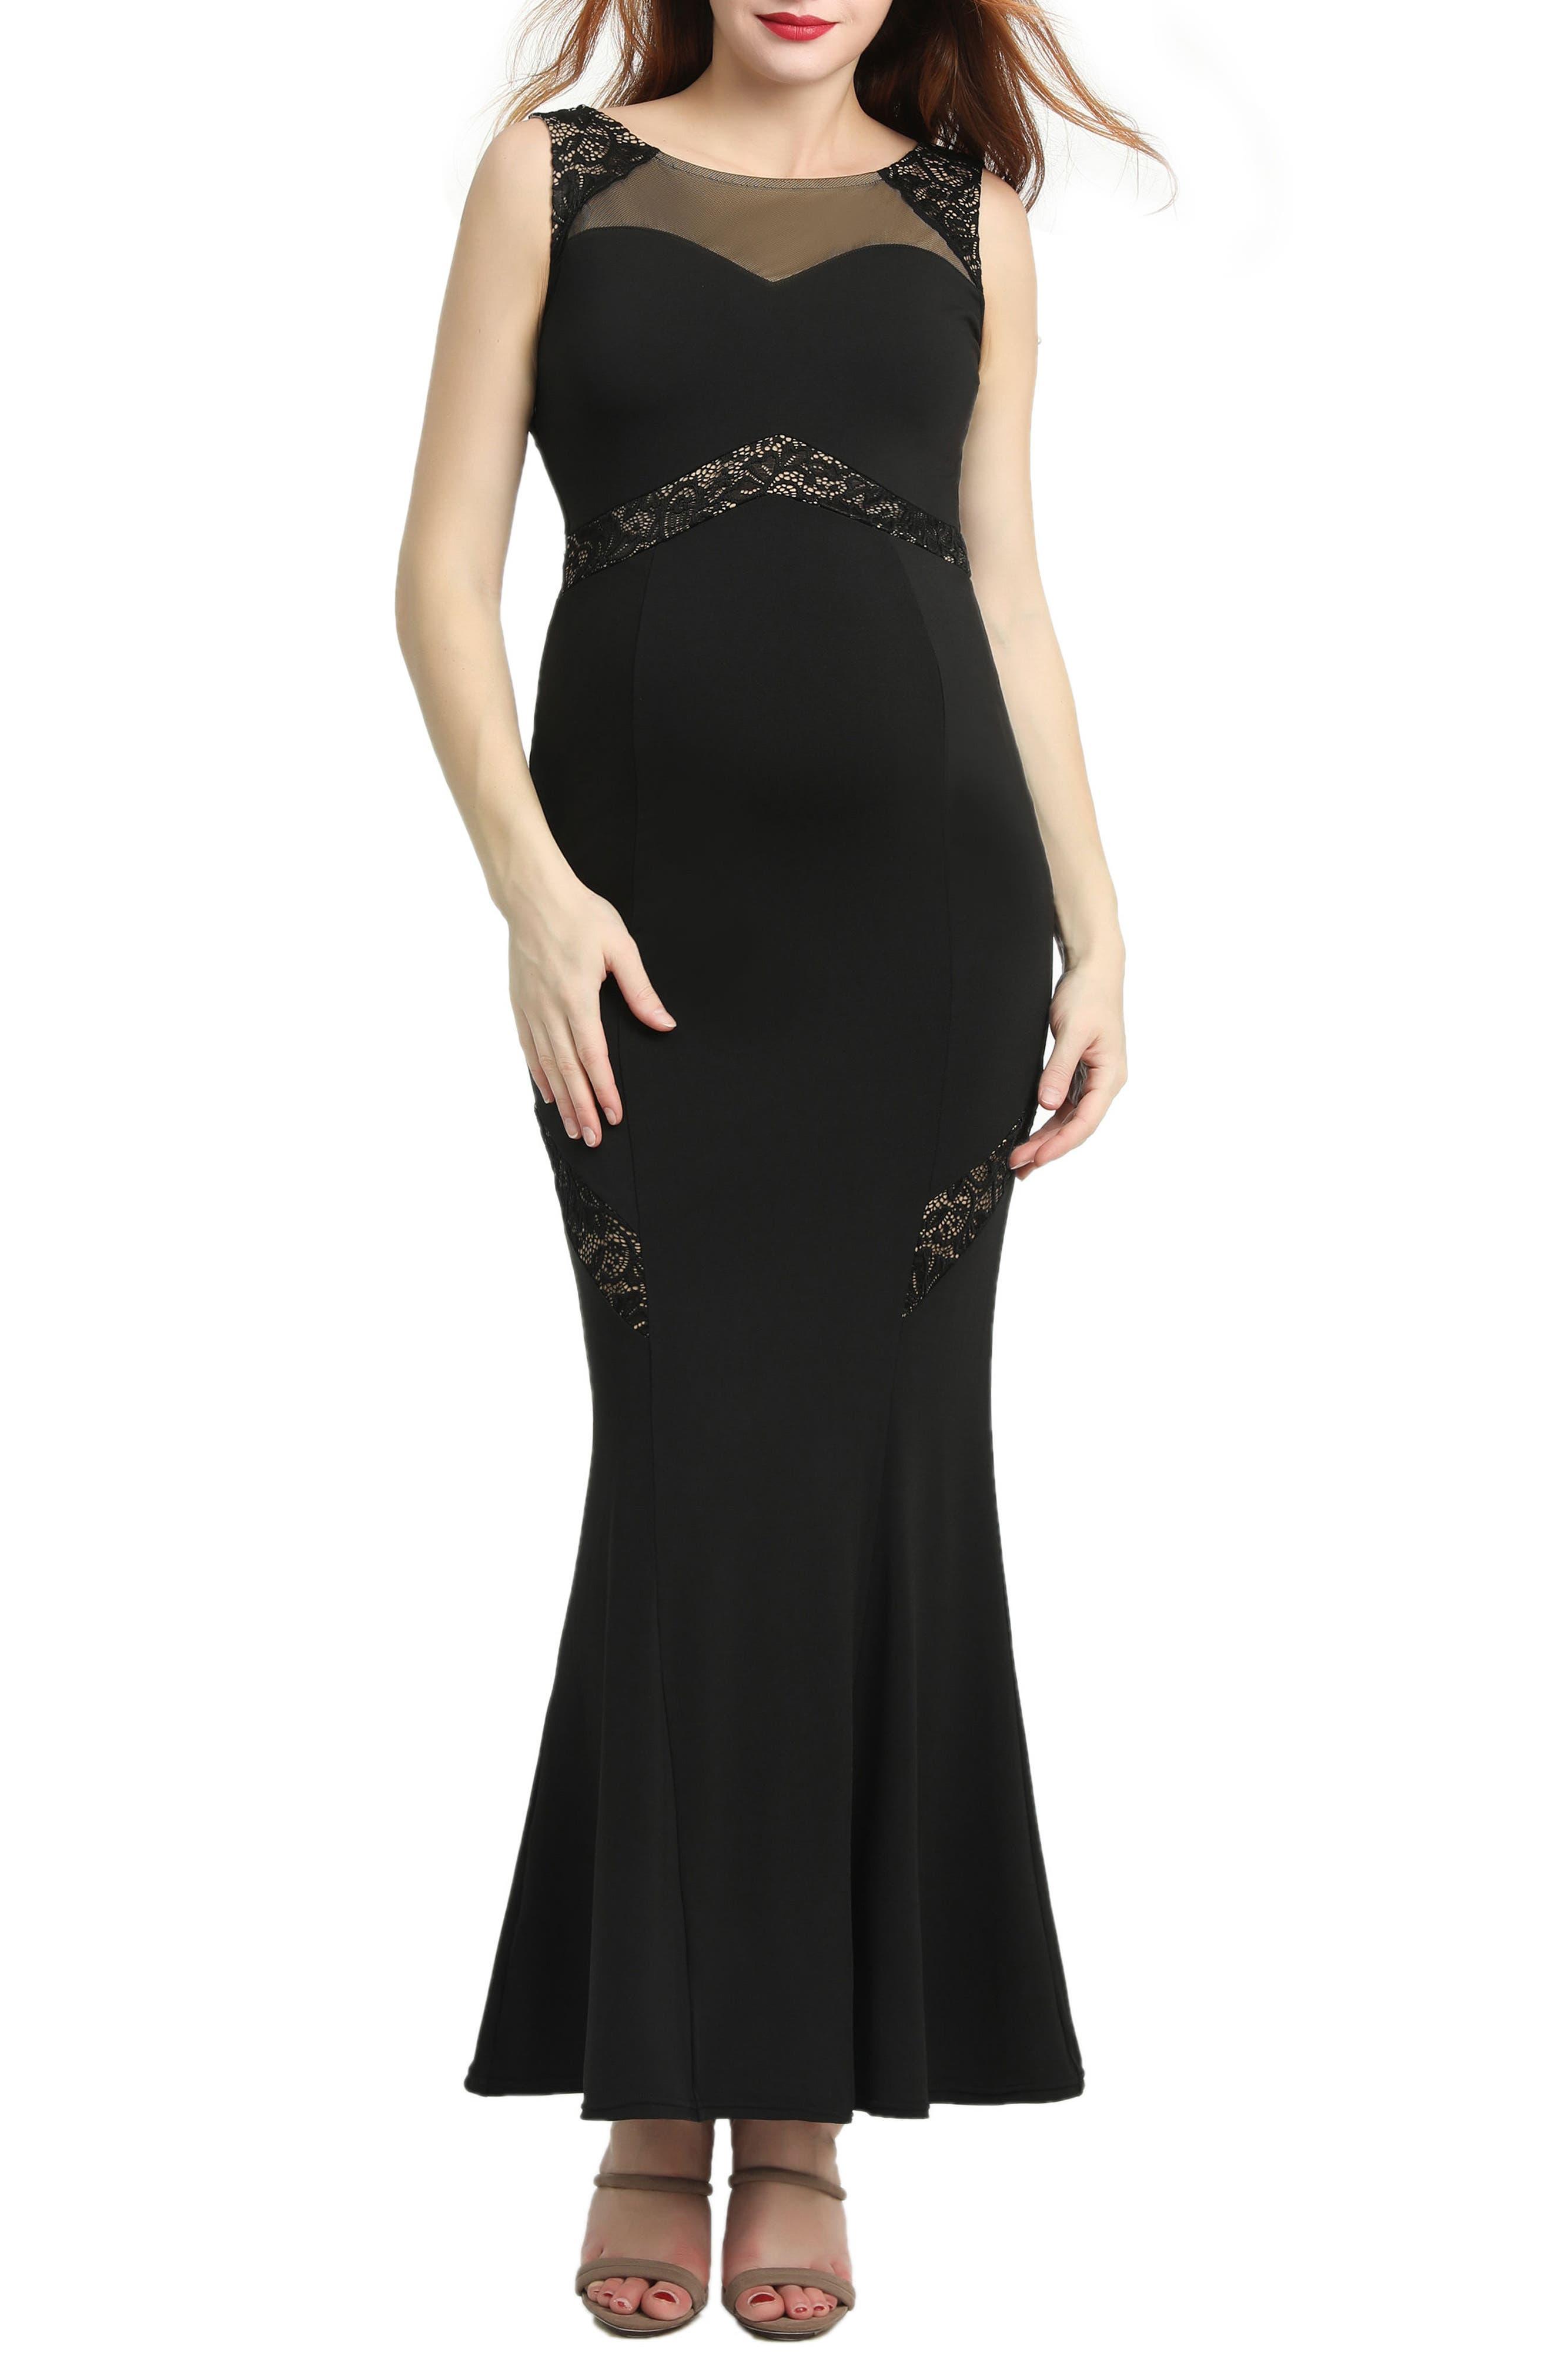 KIMI AND KAI,                             Corinne Lace Trim Maternity Mermaid Maxi Dress,                             Main thumbnail 1, color,                             BLACK